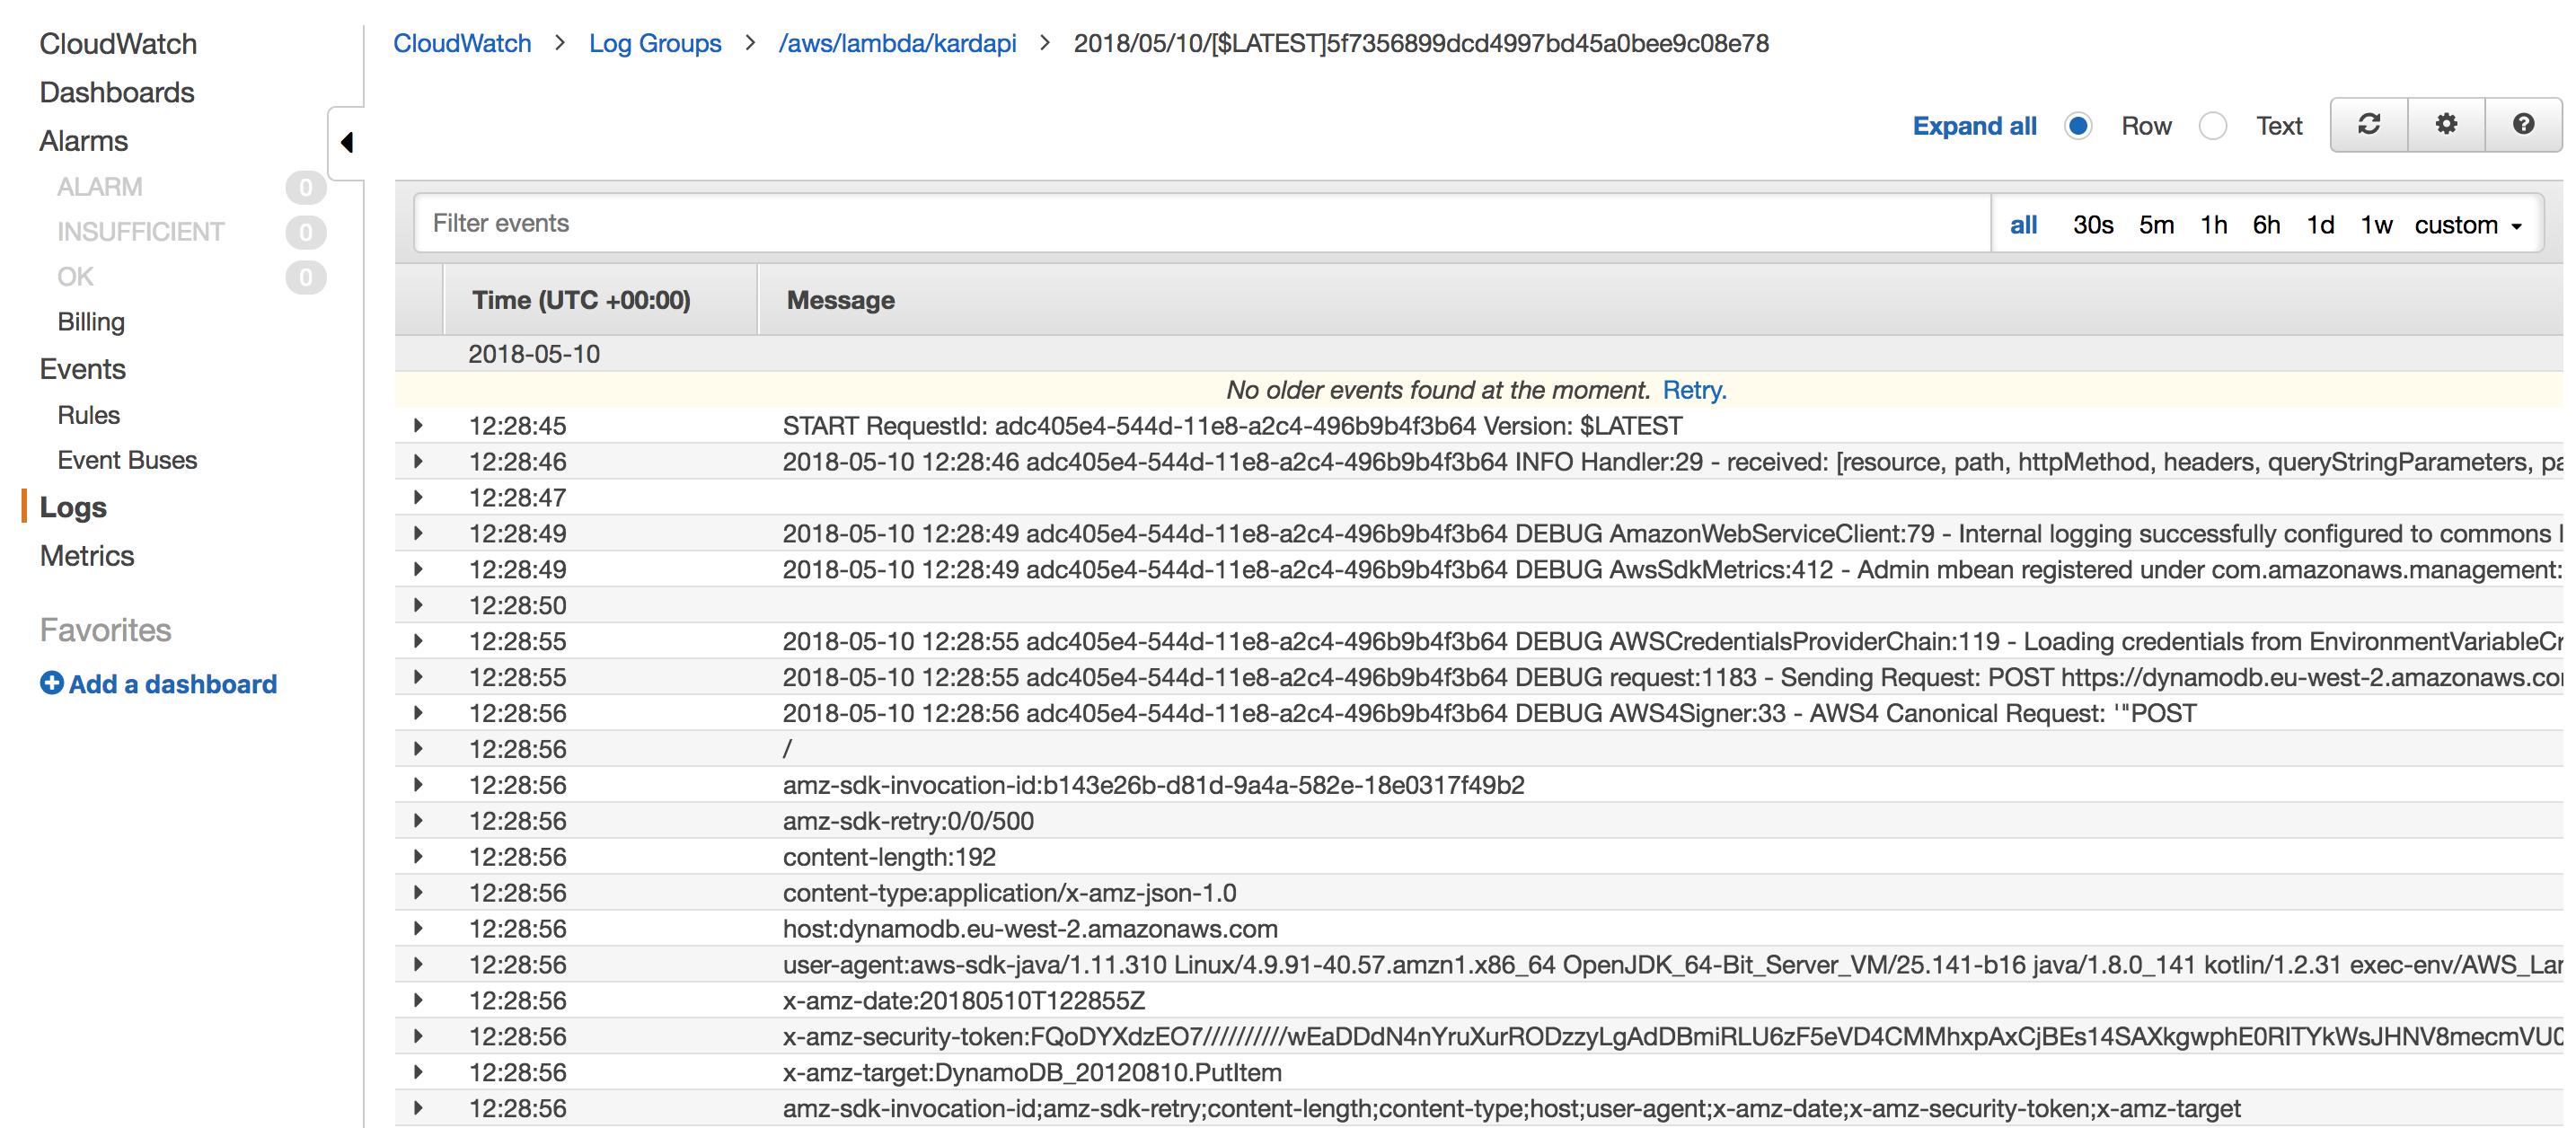 Snapshot of CloudWatch logging